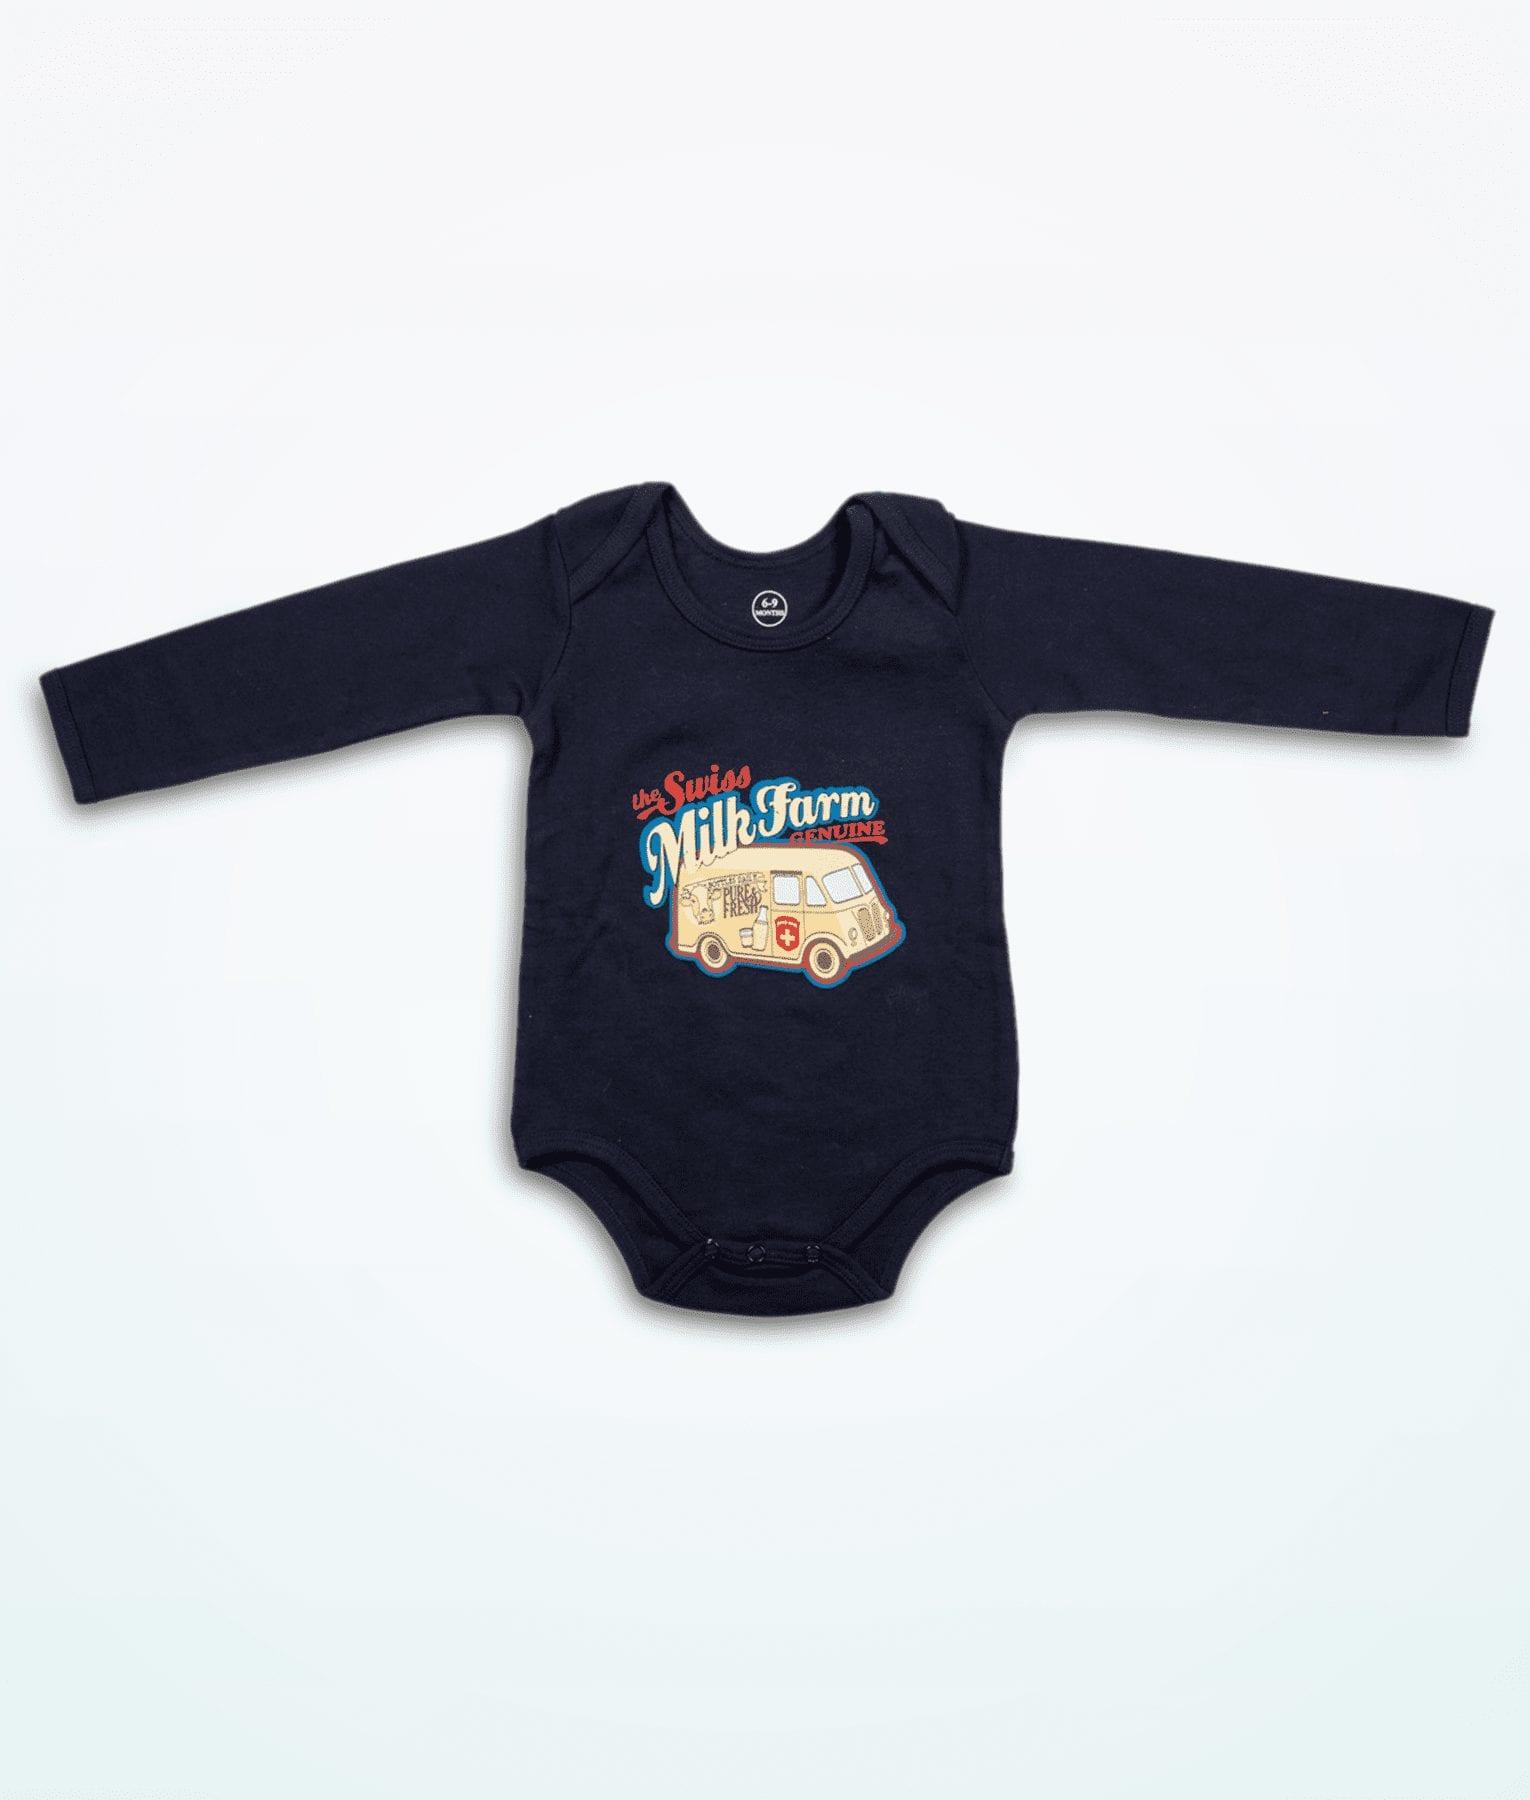 baby-body-cotton-longsleeve